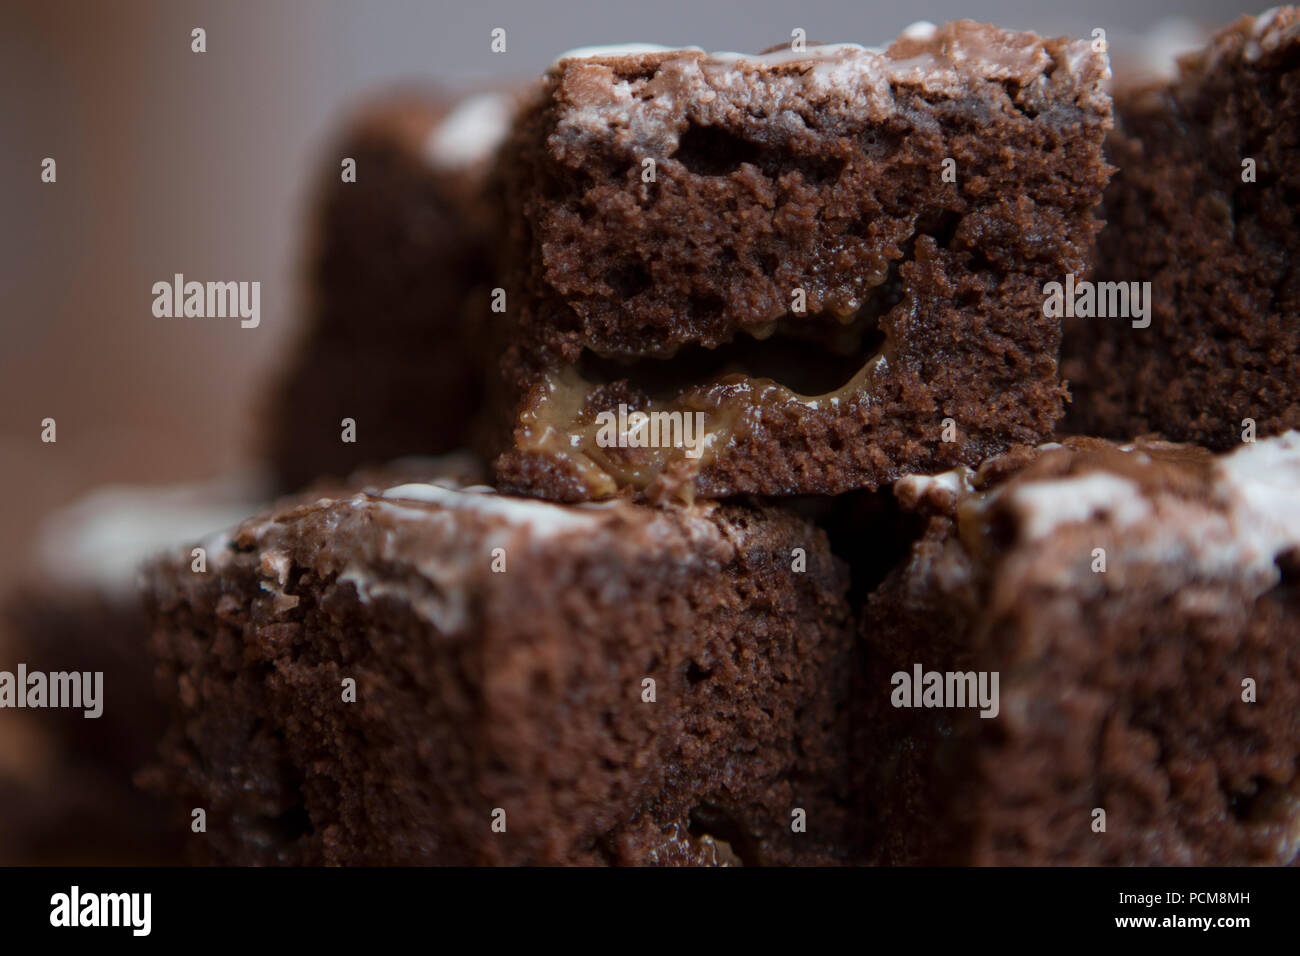 Salted caramel brownies - Stock Image